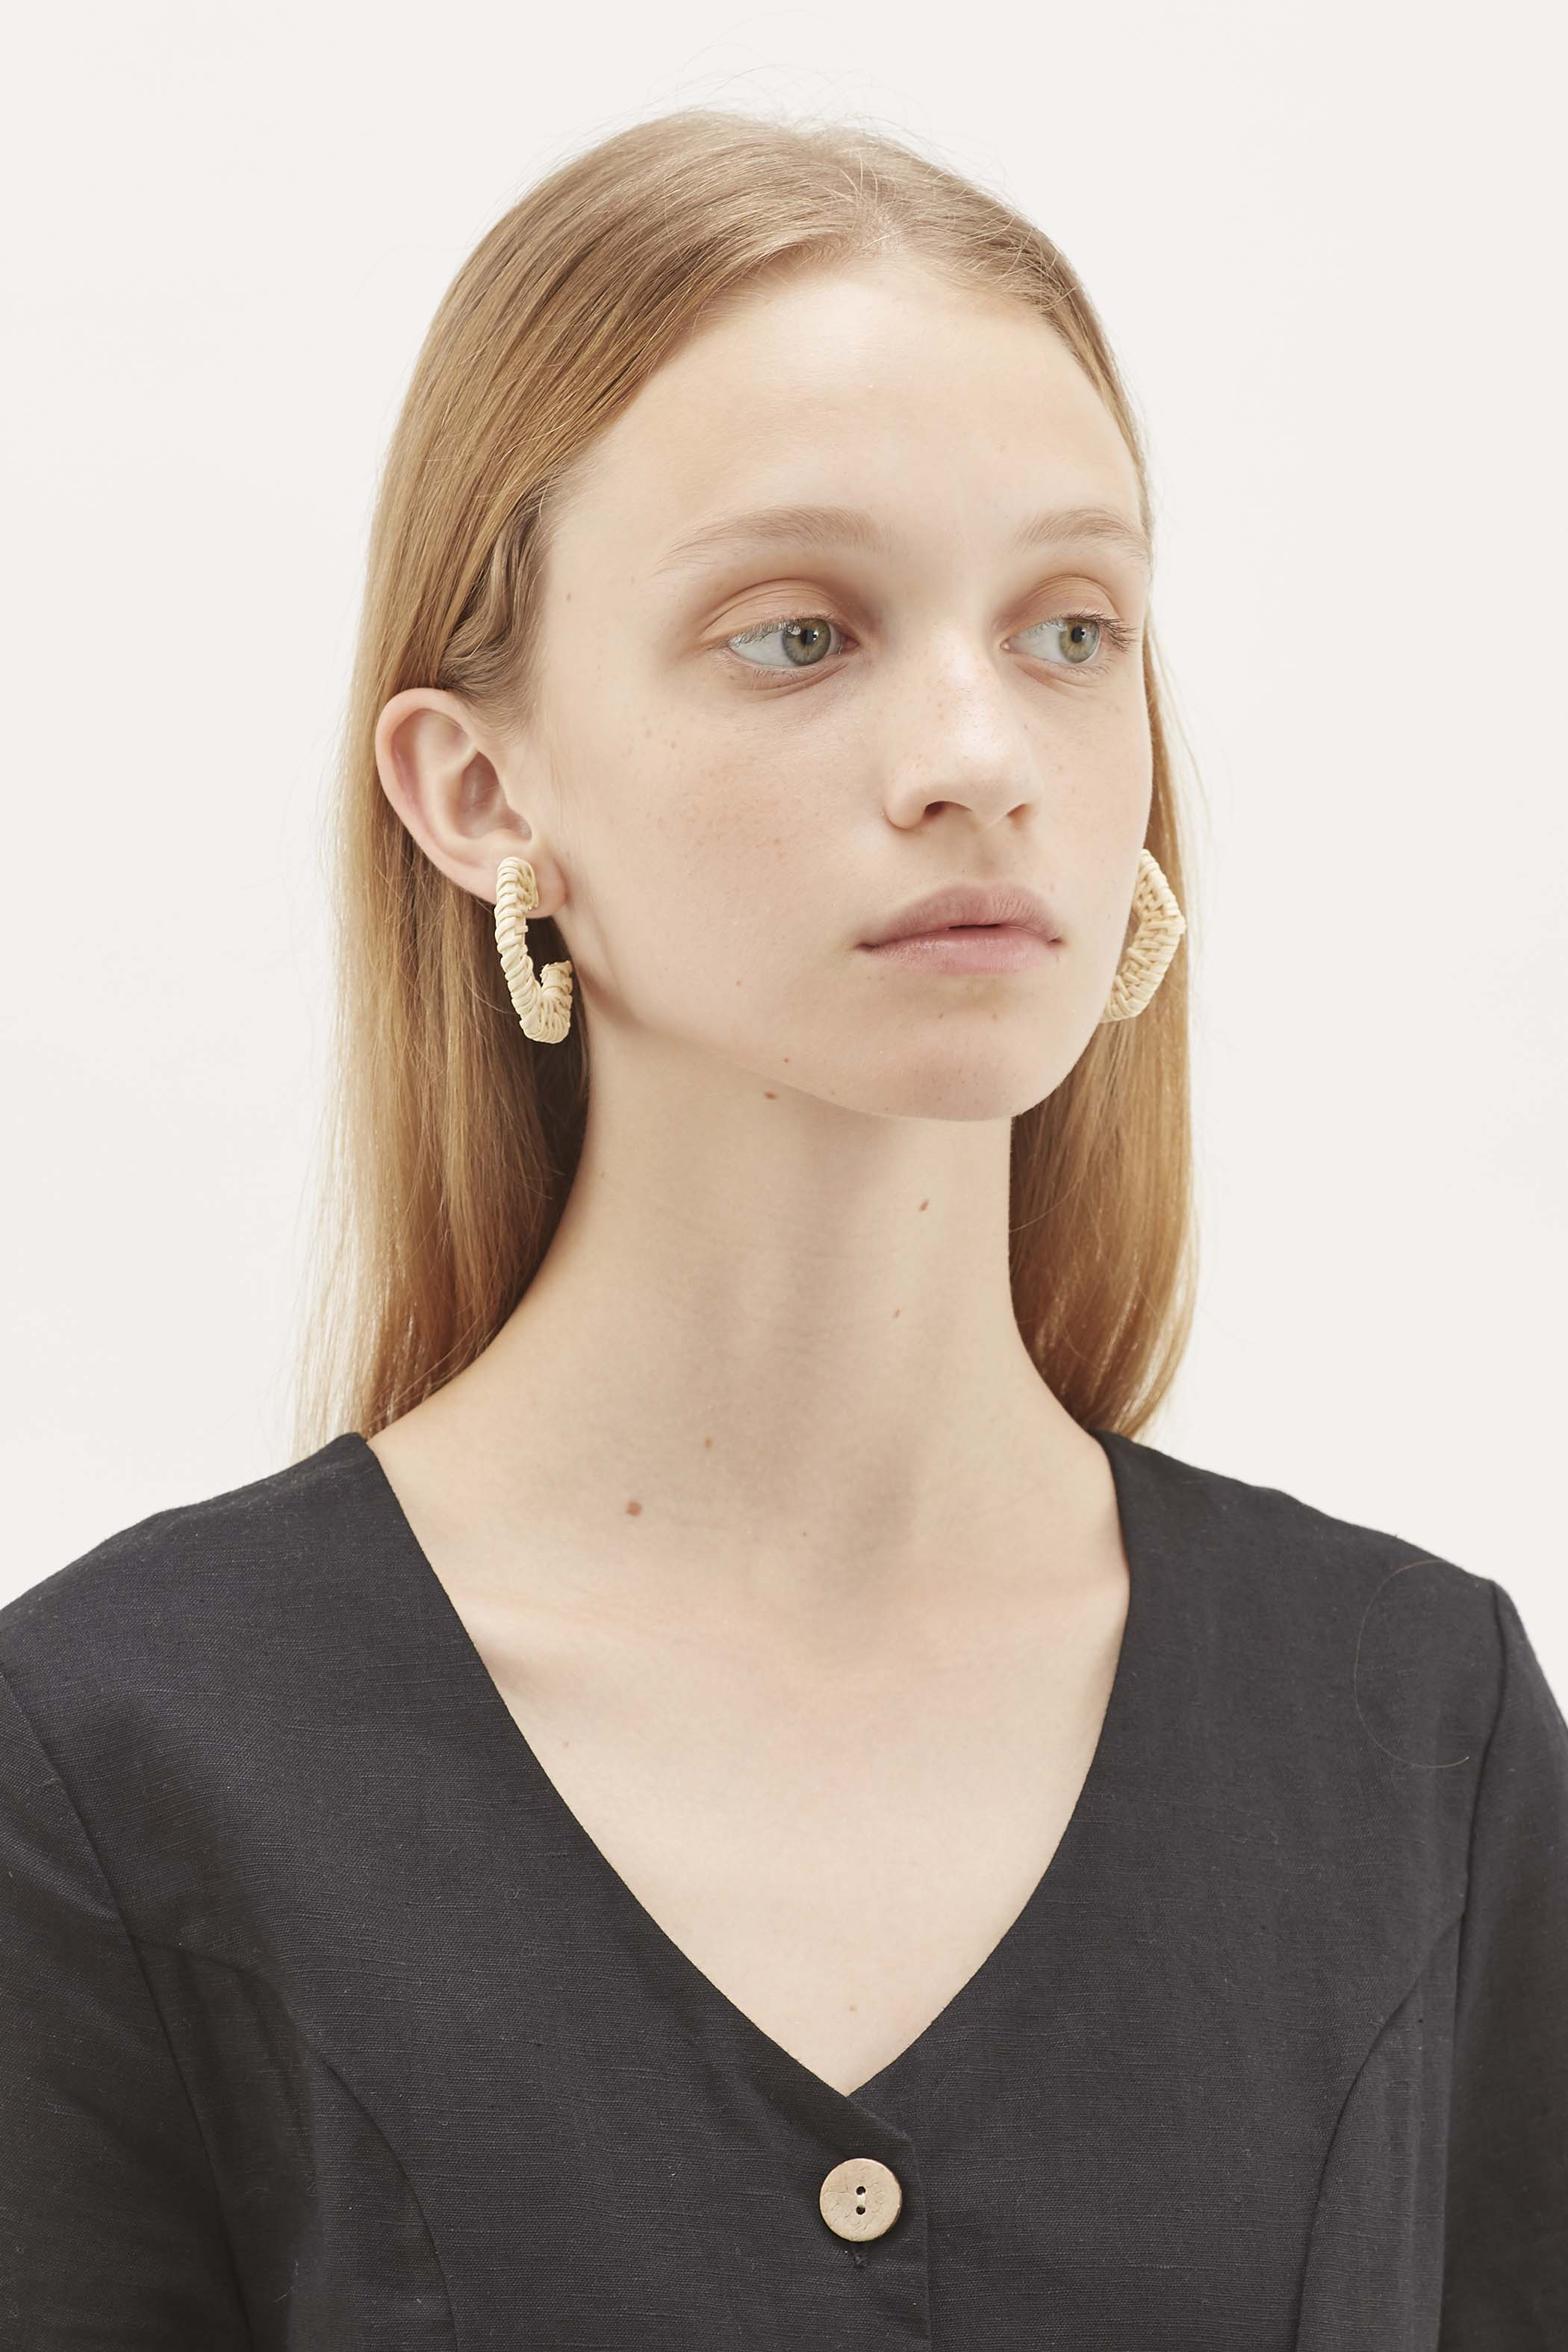 Tuva Weaved Earrings